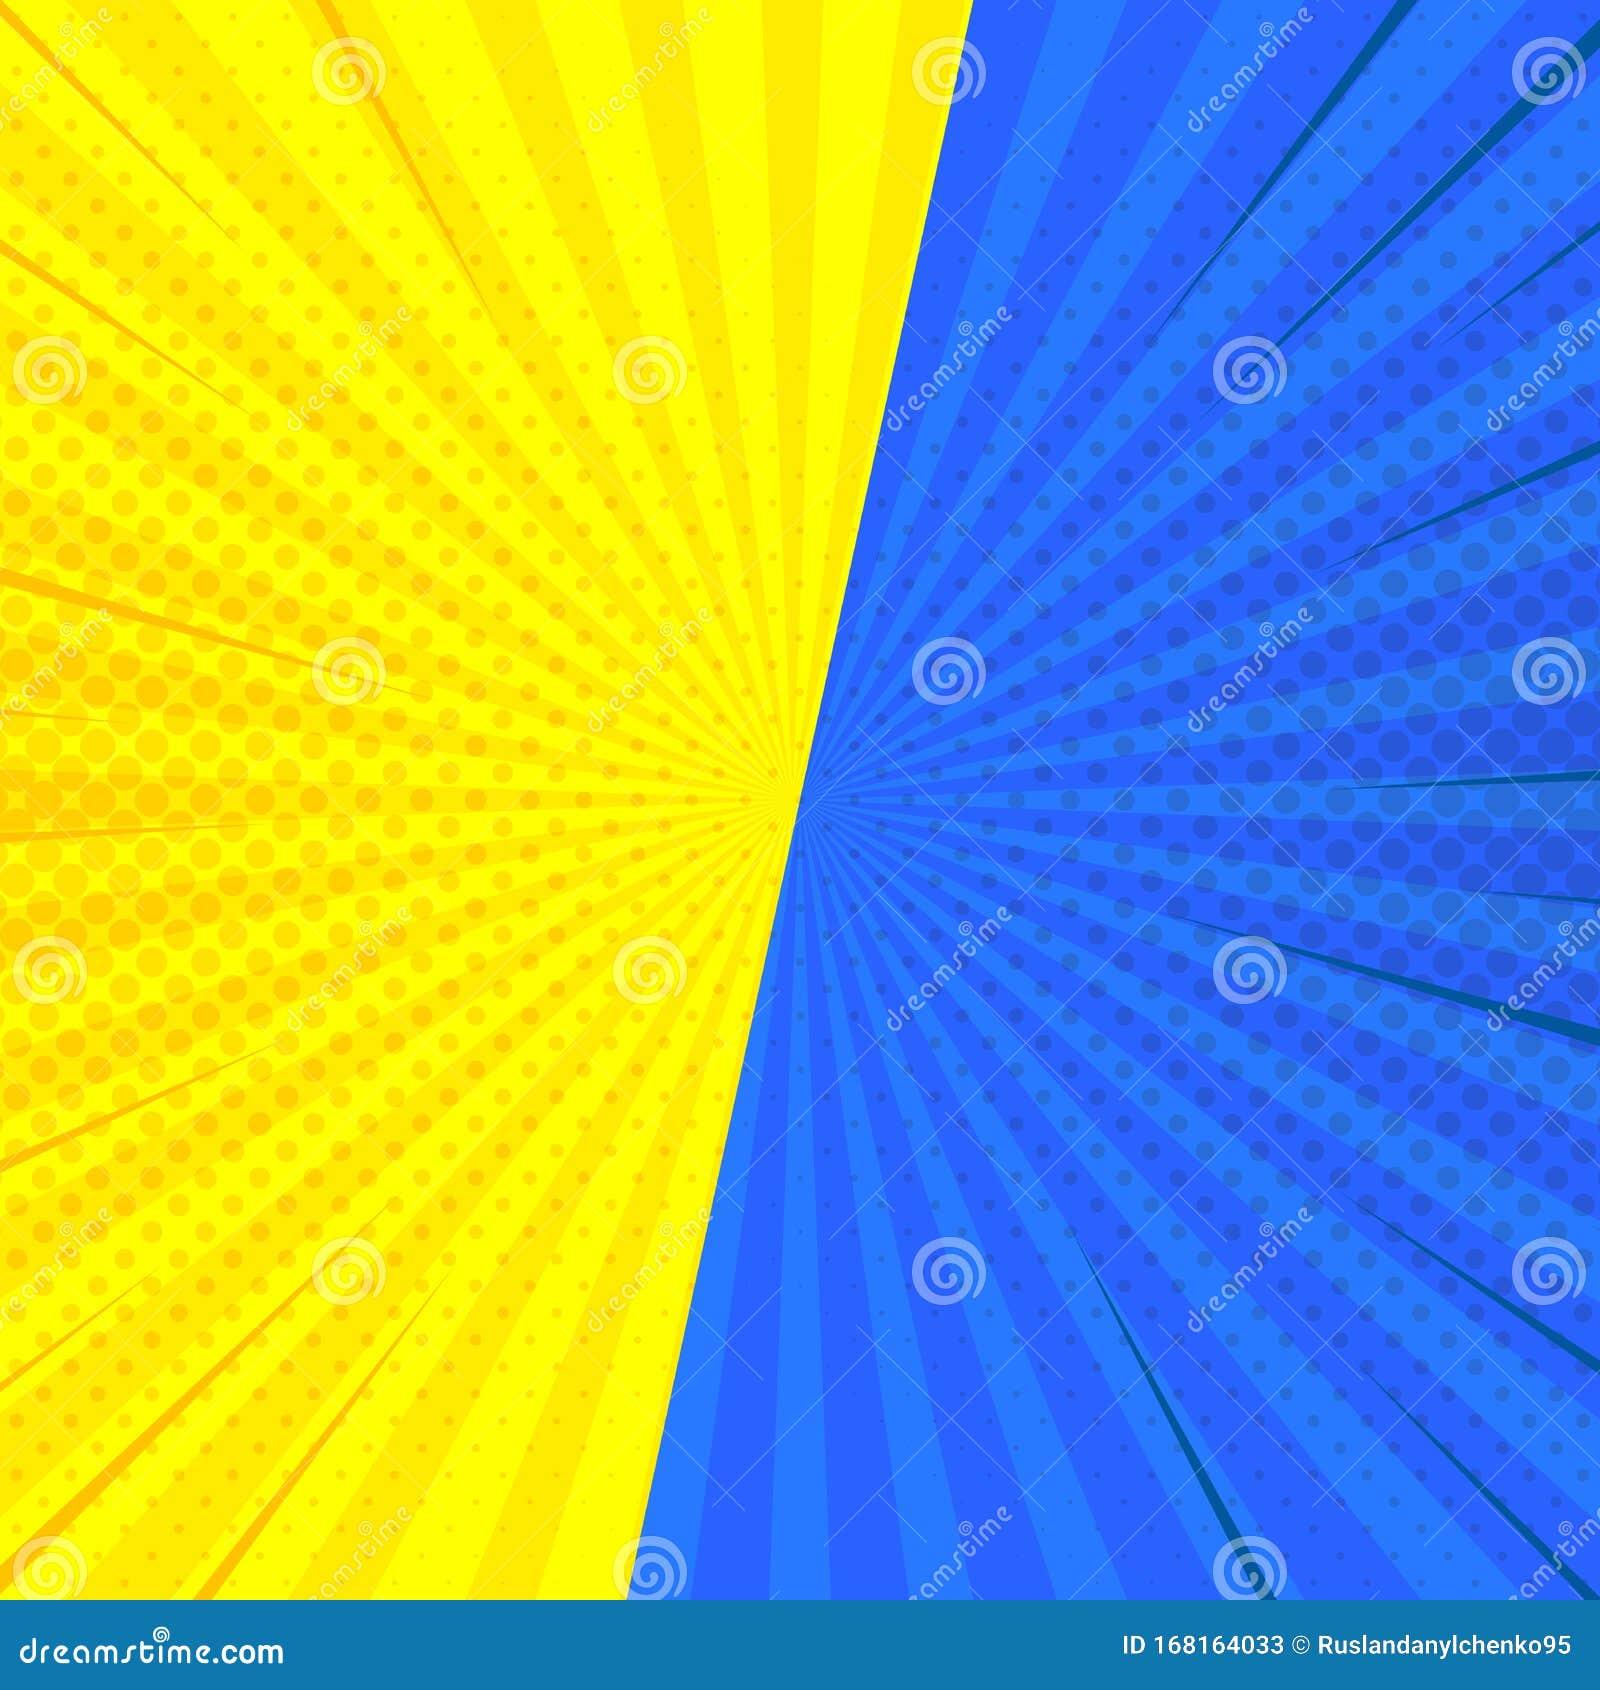 blue blast vector background stock illustrations 3 066 blue blast vector background stock illustrations vectors clipart dreamstime dreamstime com